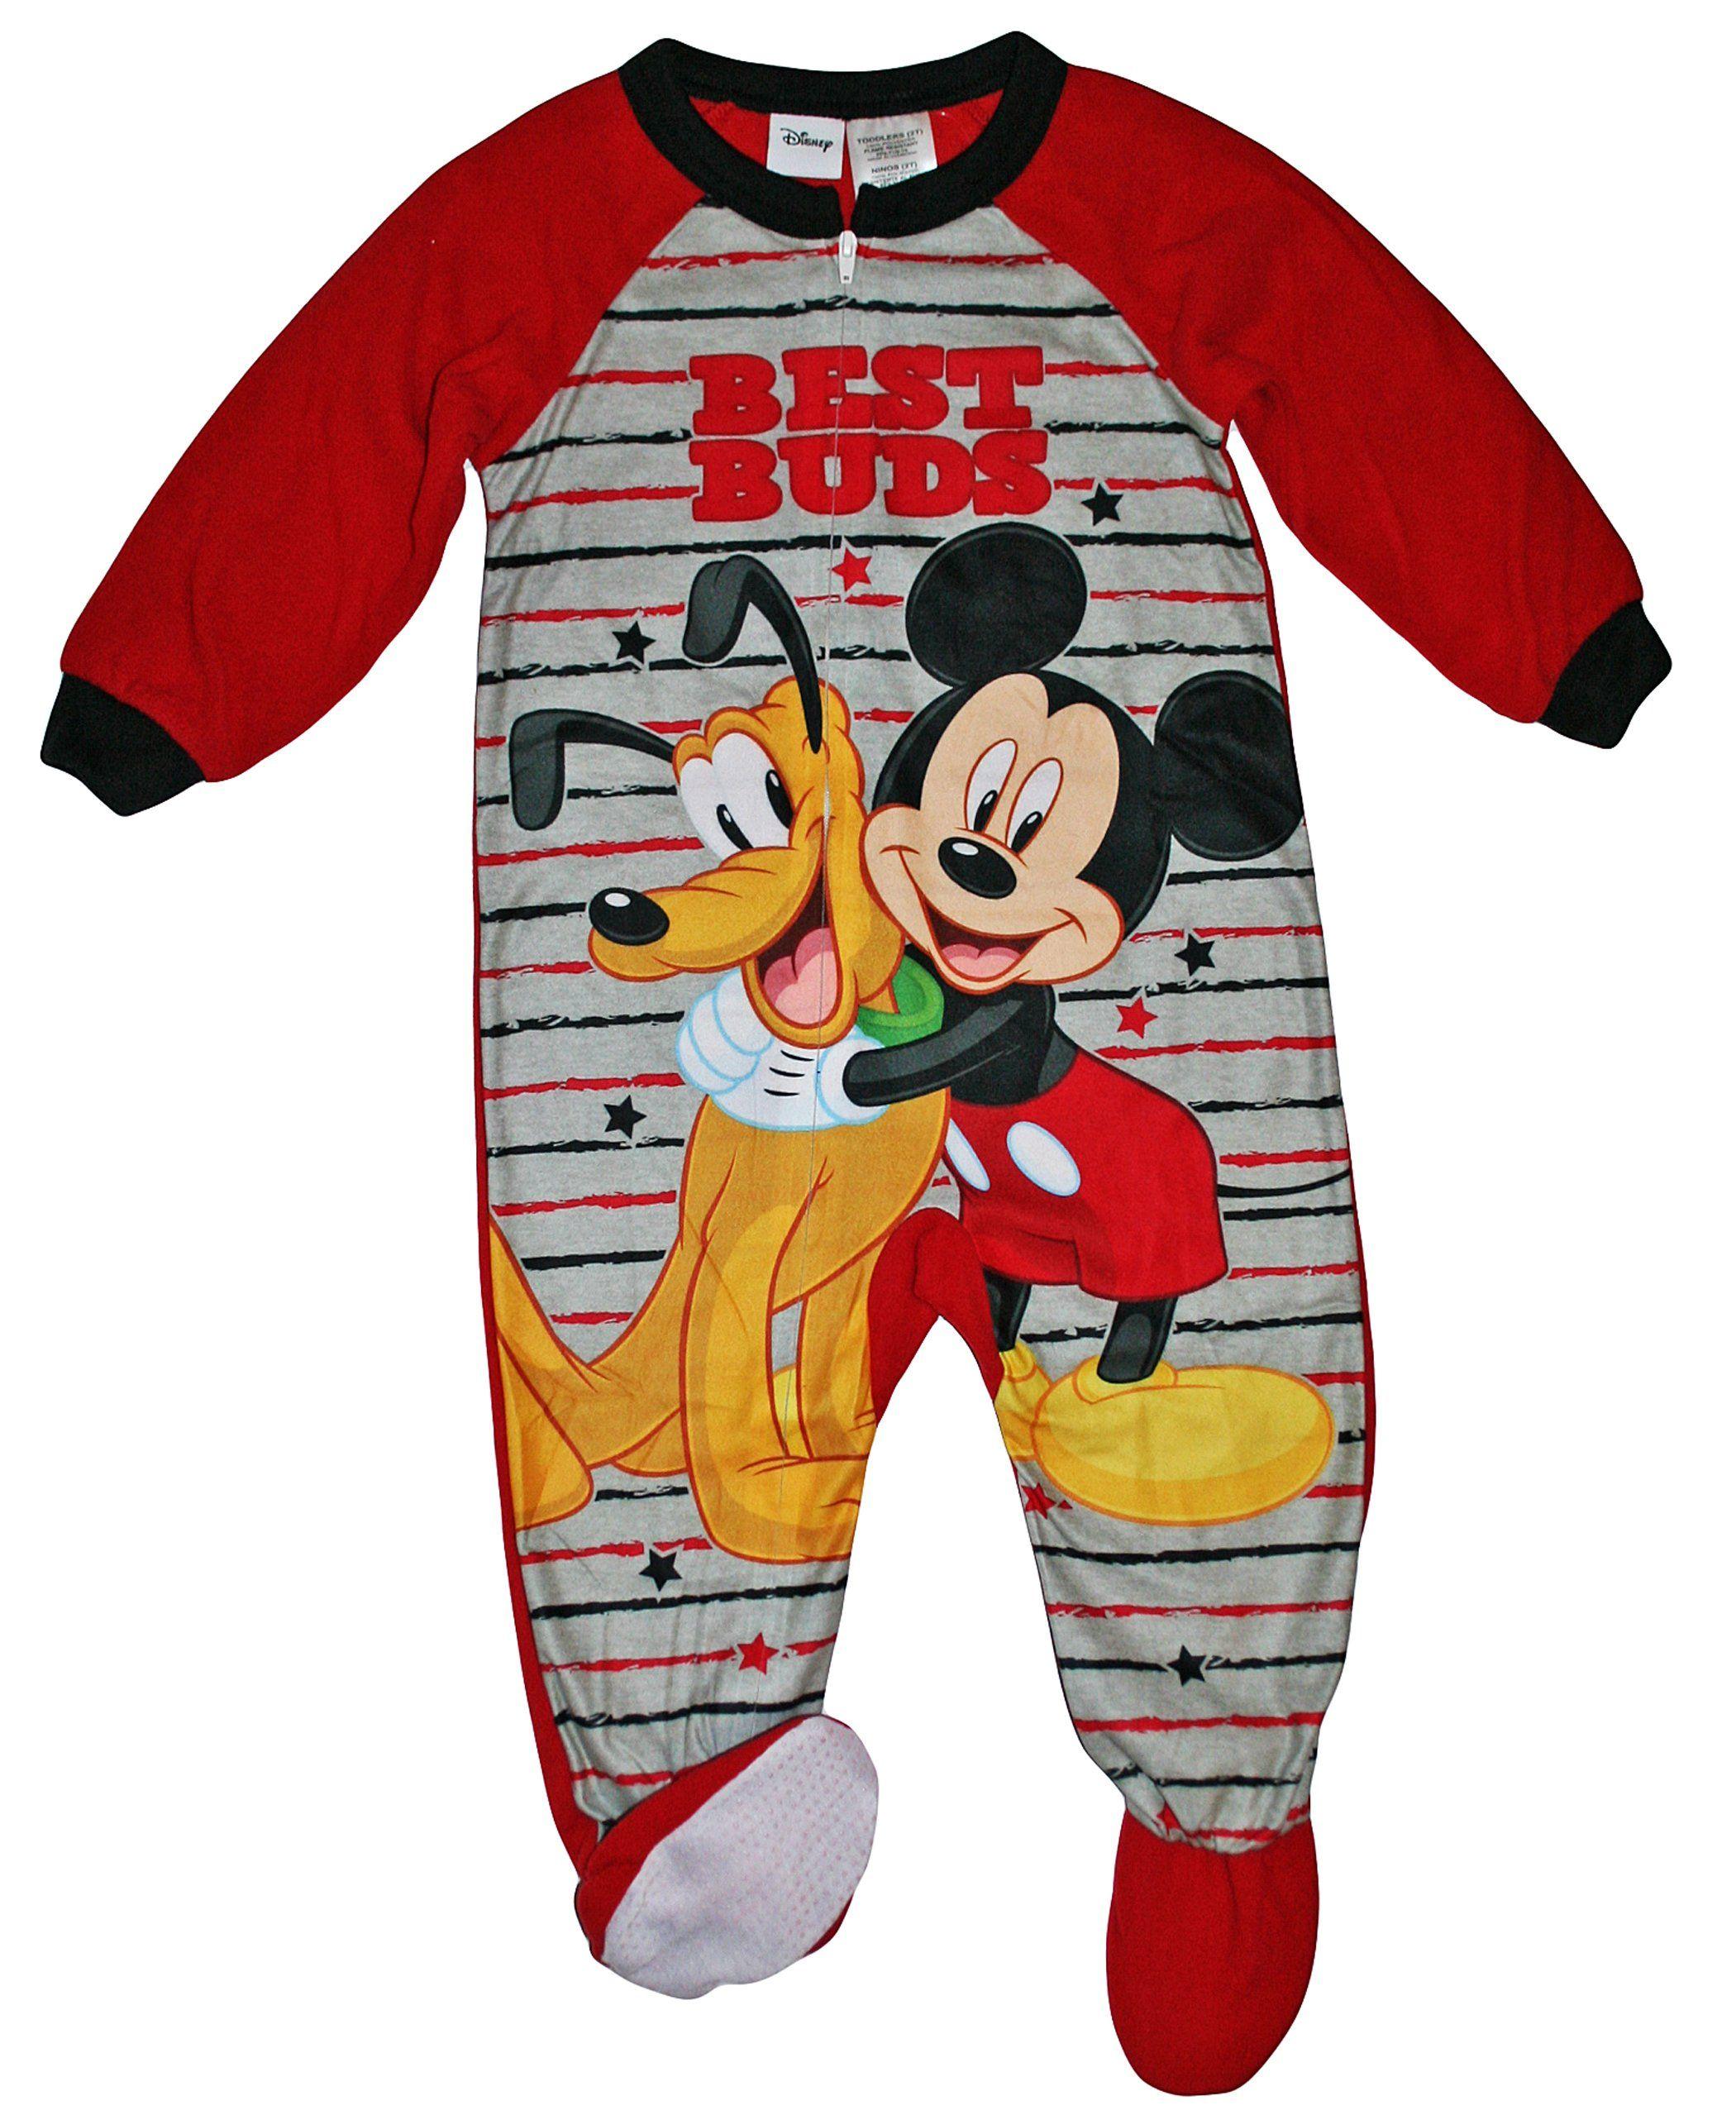 Disney Mickey Mouse & Pluto Blanket Sleeper Pajama Awesome